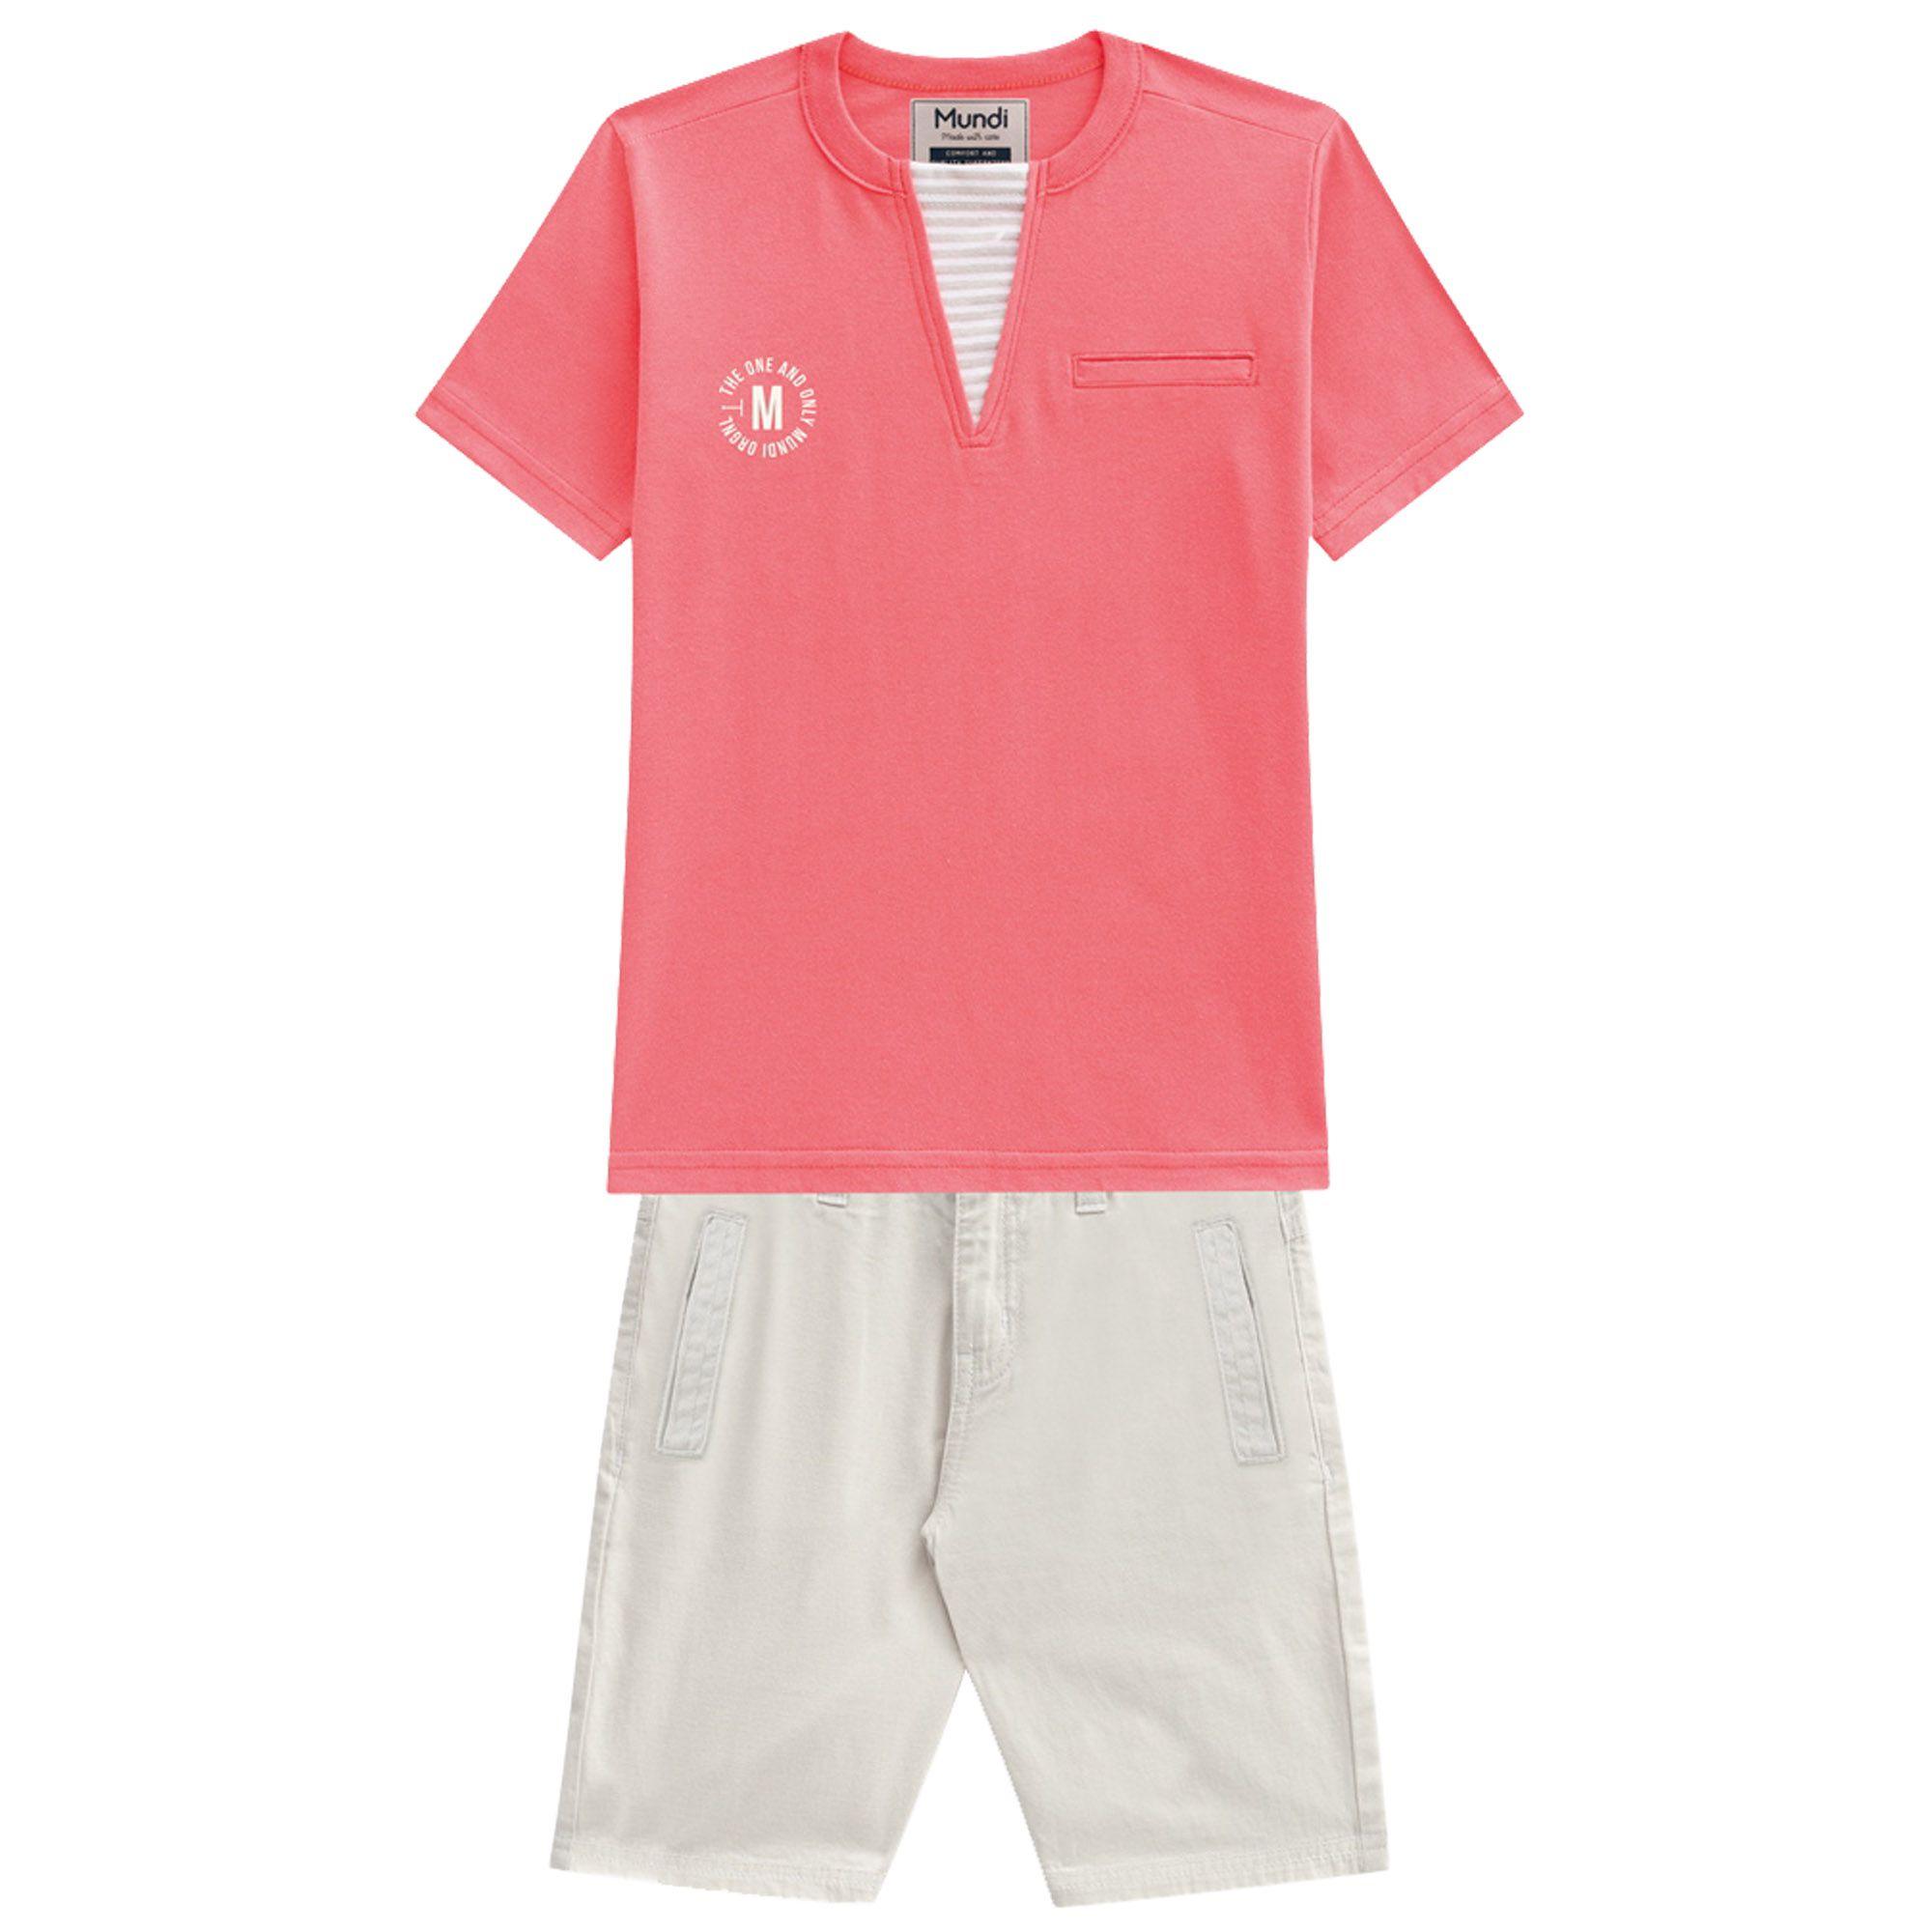 Conjunto Verão Brandili Mundi Camiseta The One and Only com Bermuda Sarja - 4 ao 10